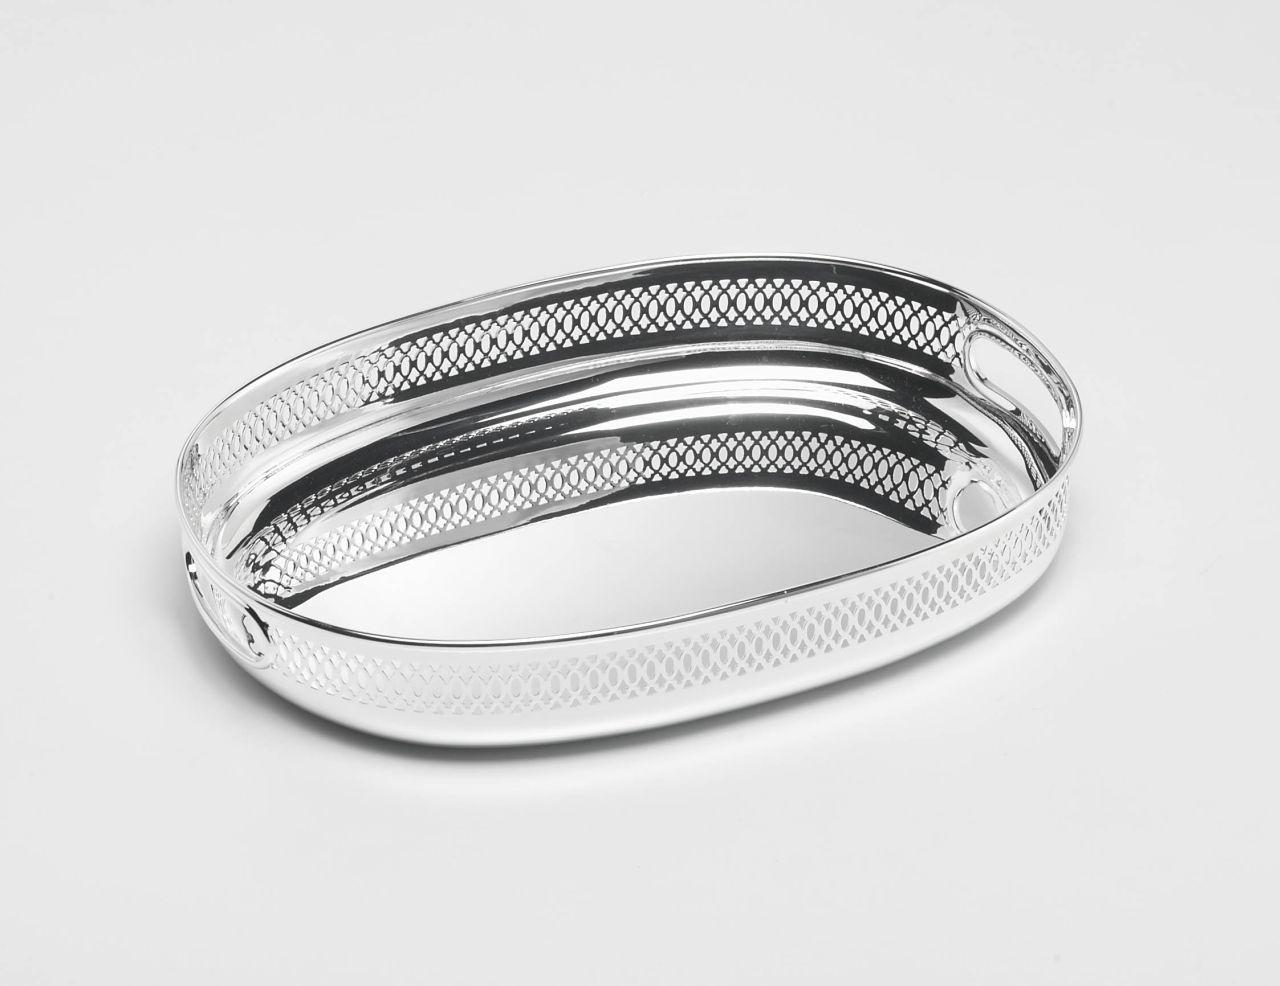 Vassoio ovale griglia stile Inglese argentato argento sheffield